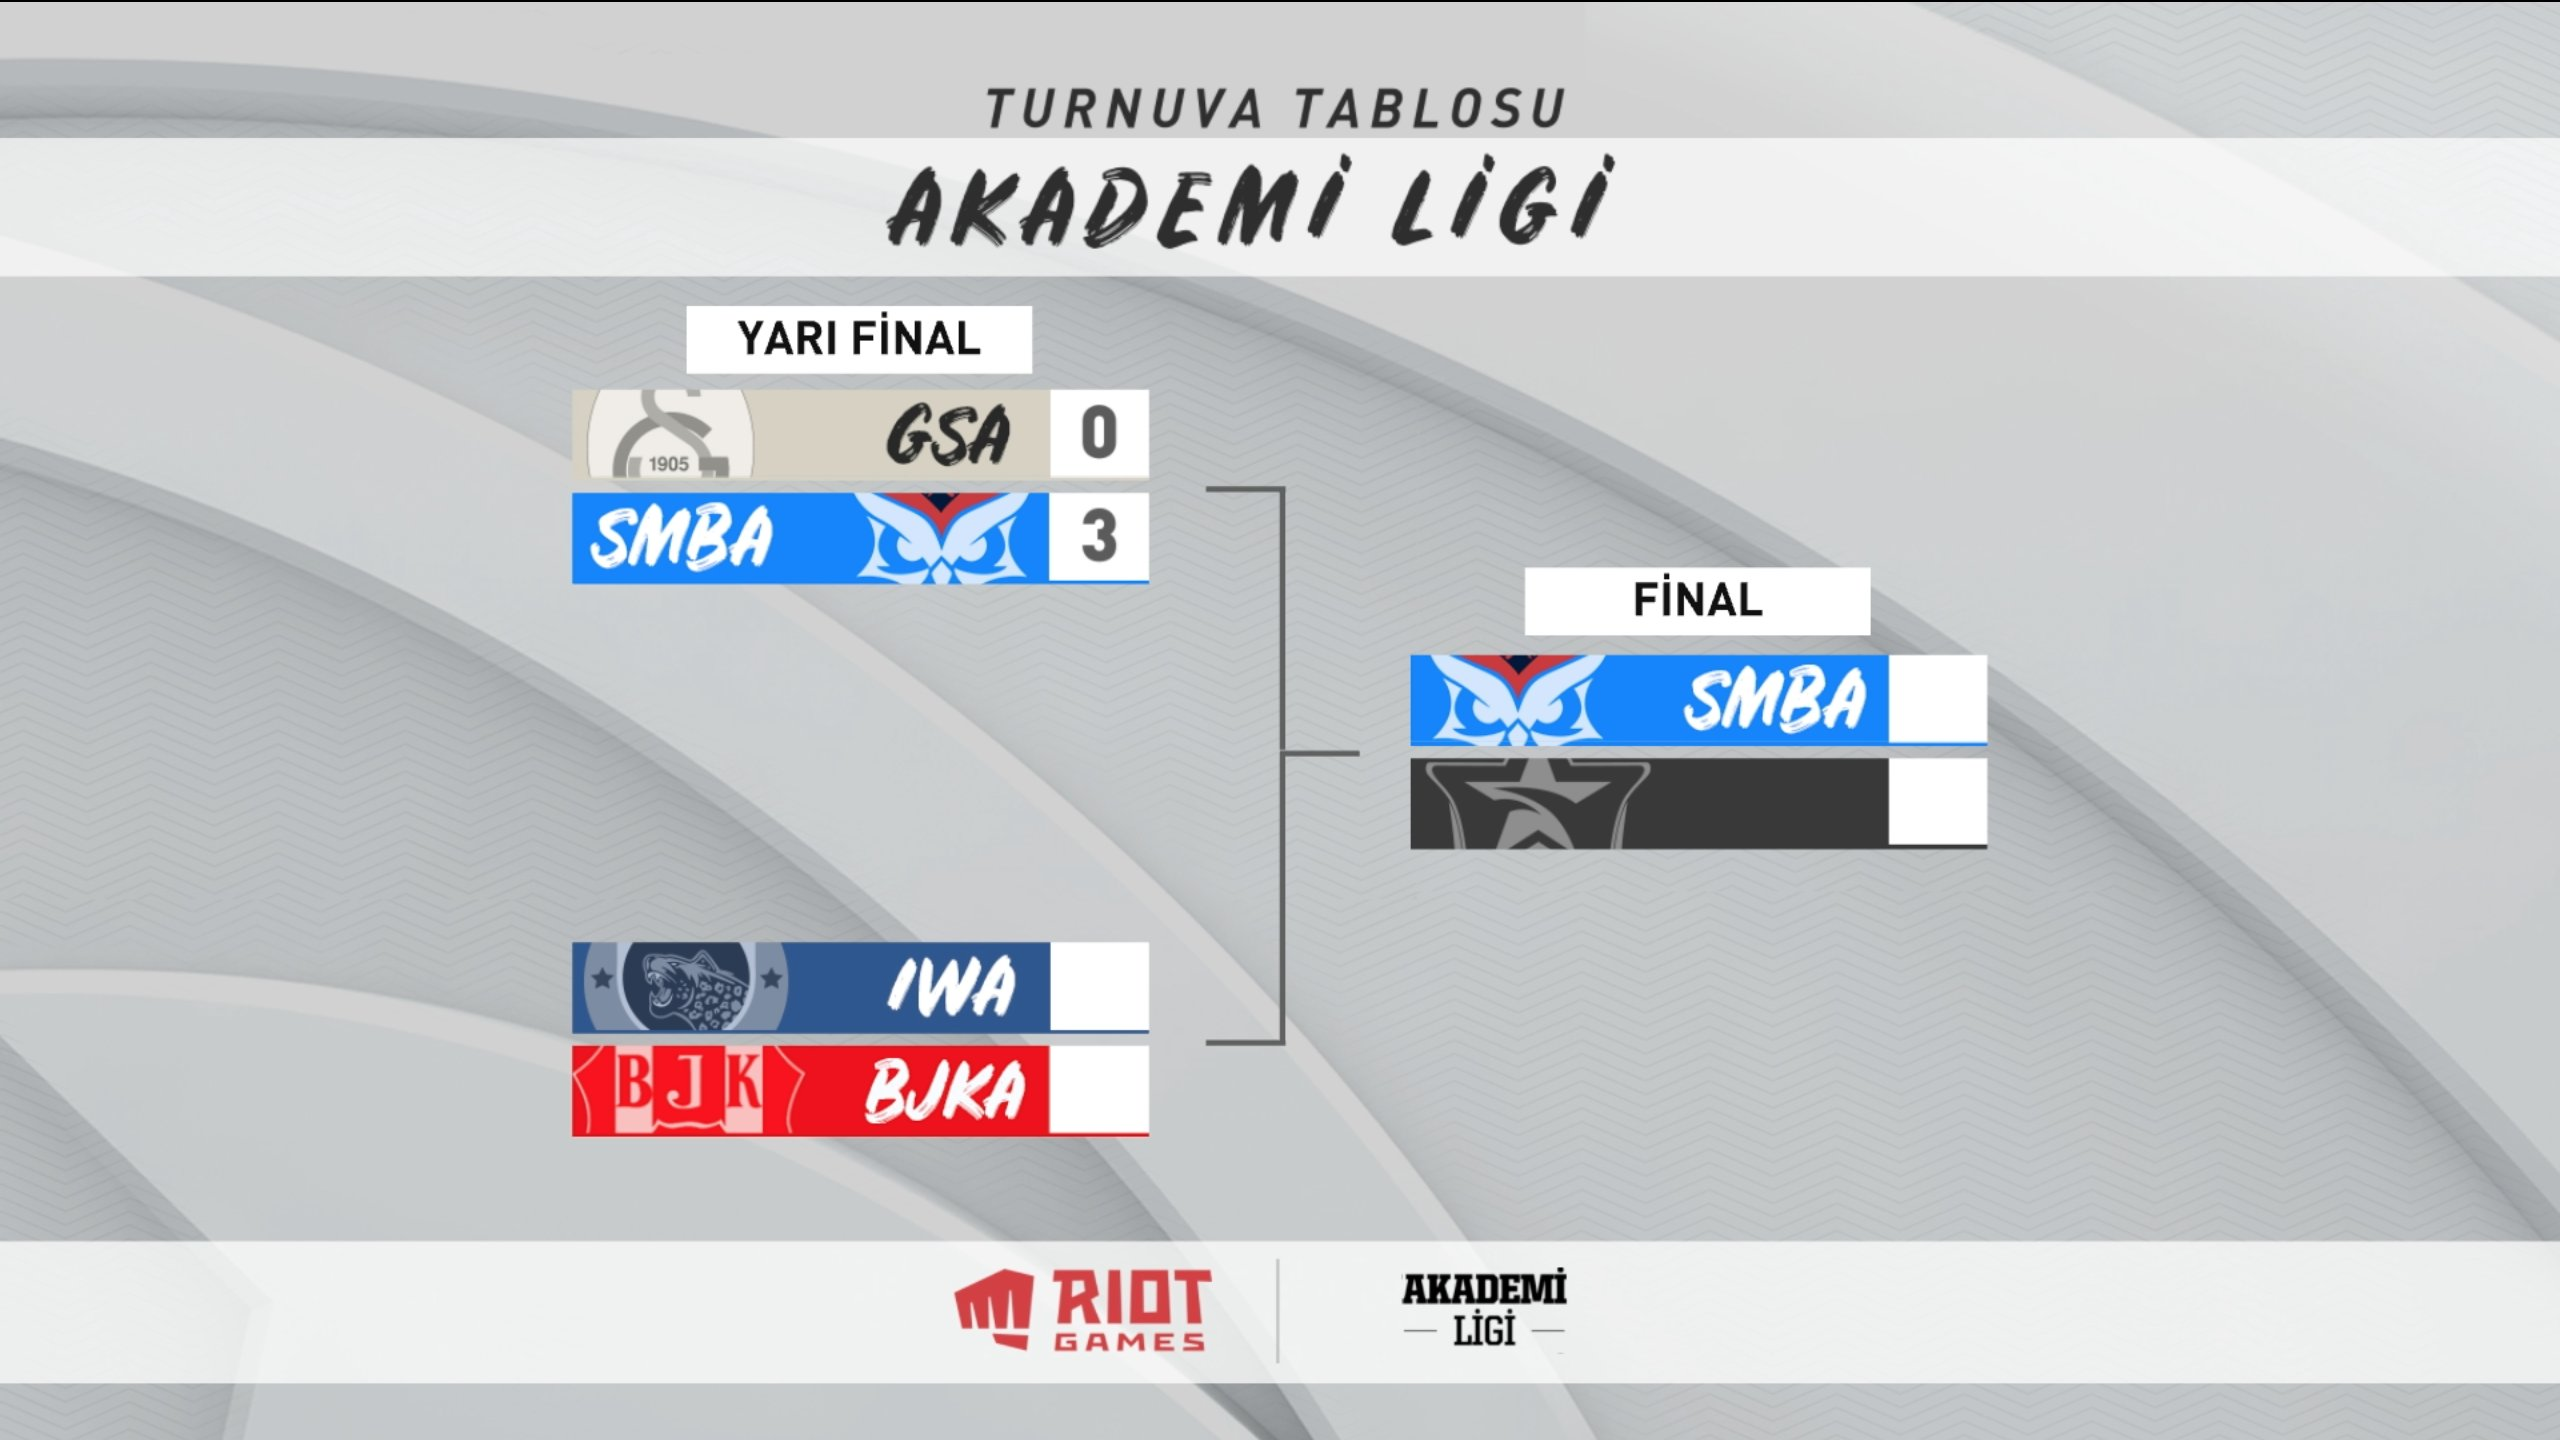 2021 Akademi Ligi Final